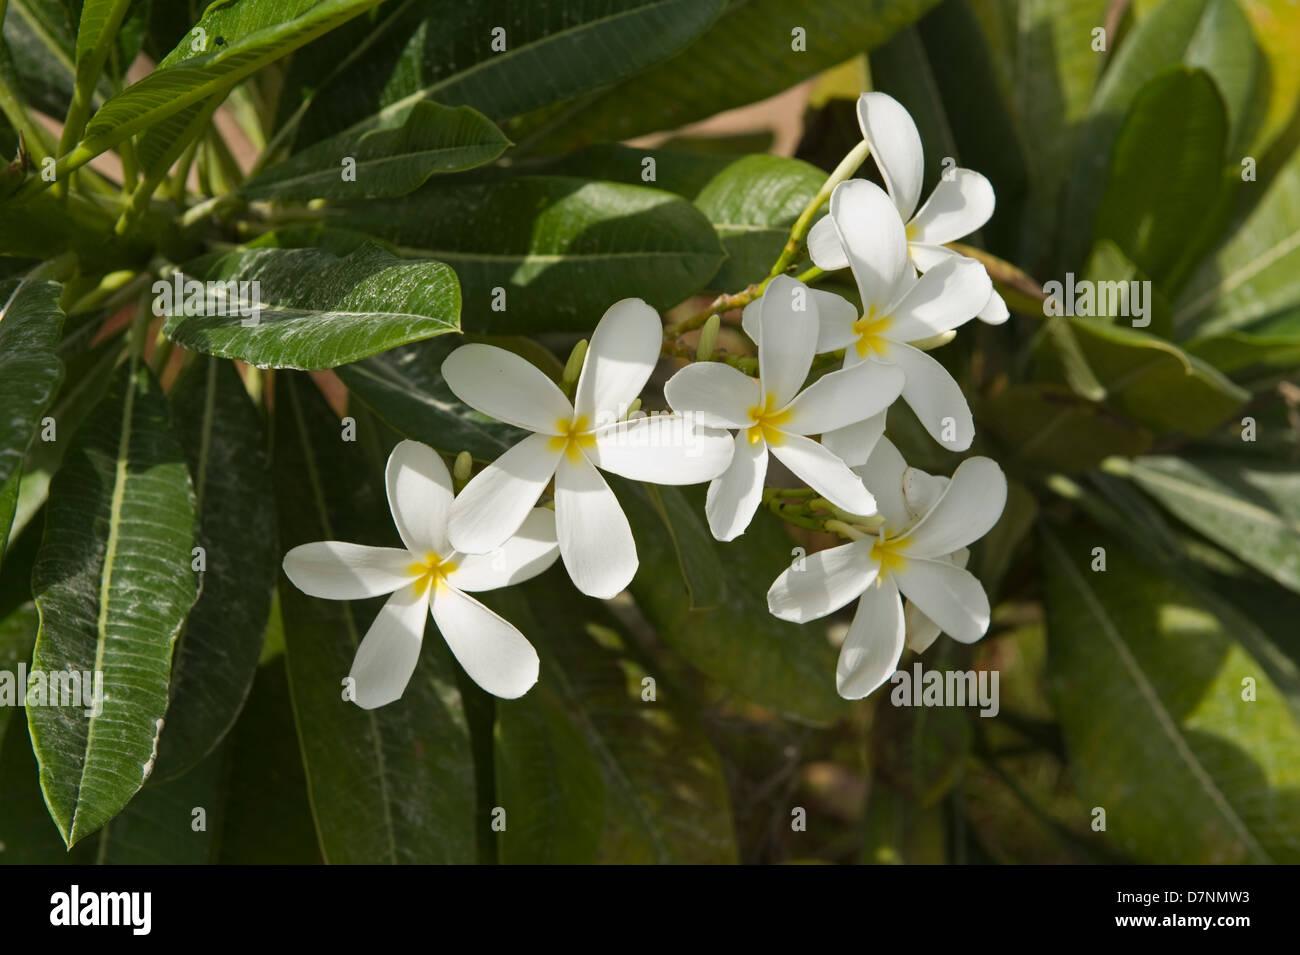 White plumeria, Plumeria alba, flowers and dusty leaves, Abu Dhabi - Stock Image